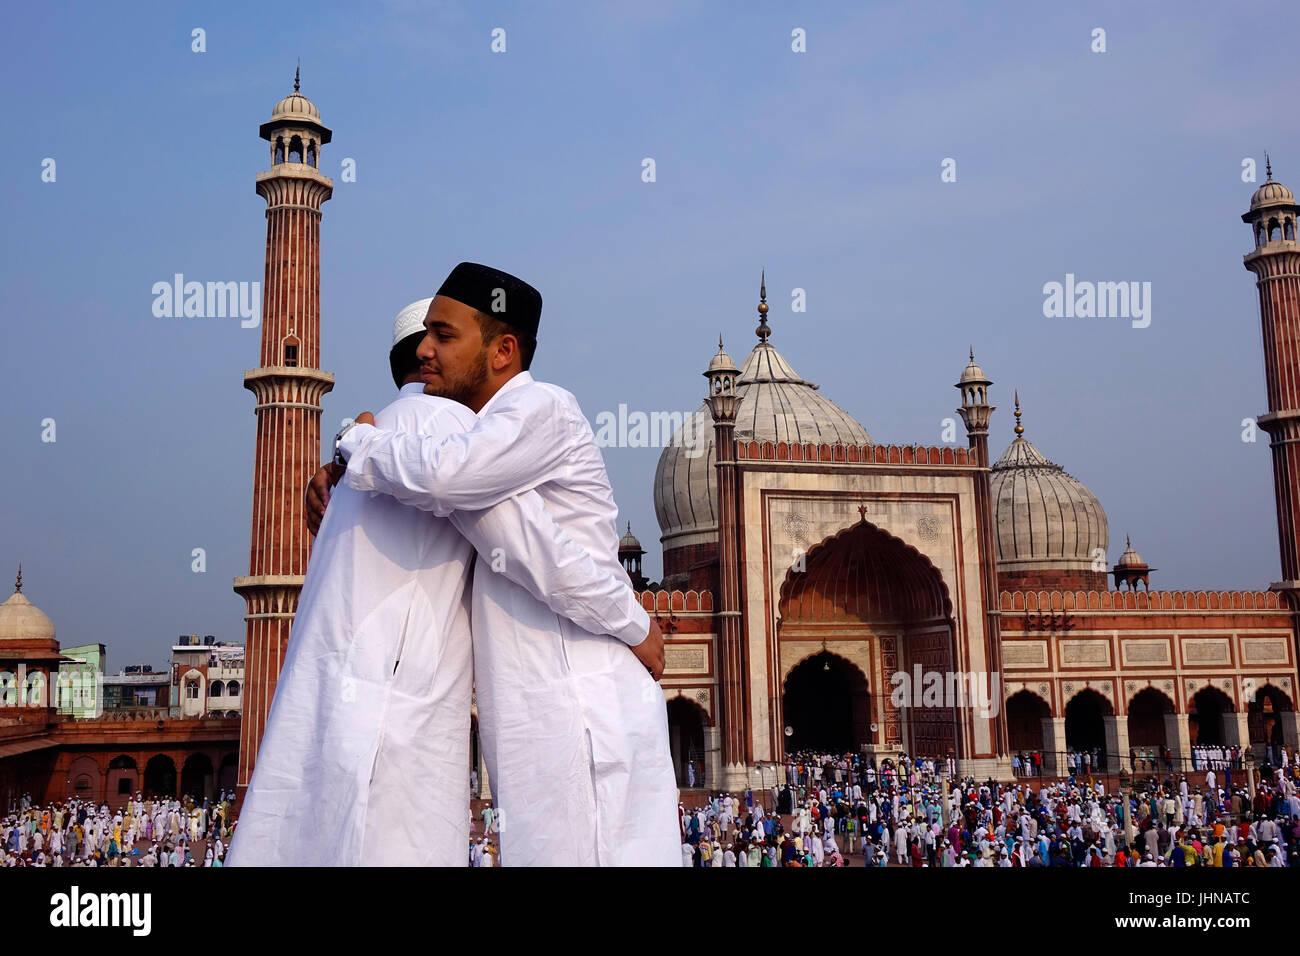 Islamic Festival Stock Photos & Islamic Festival Stock